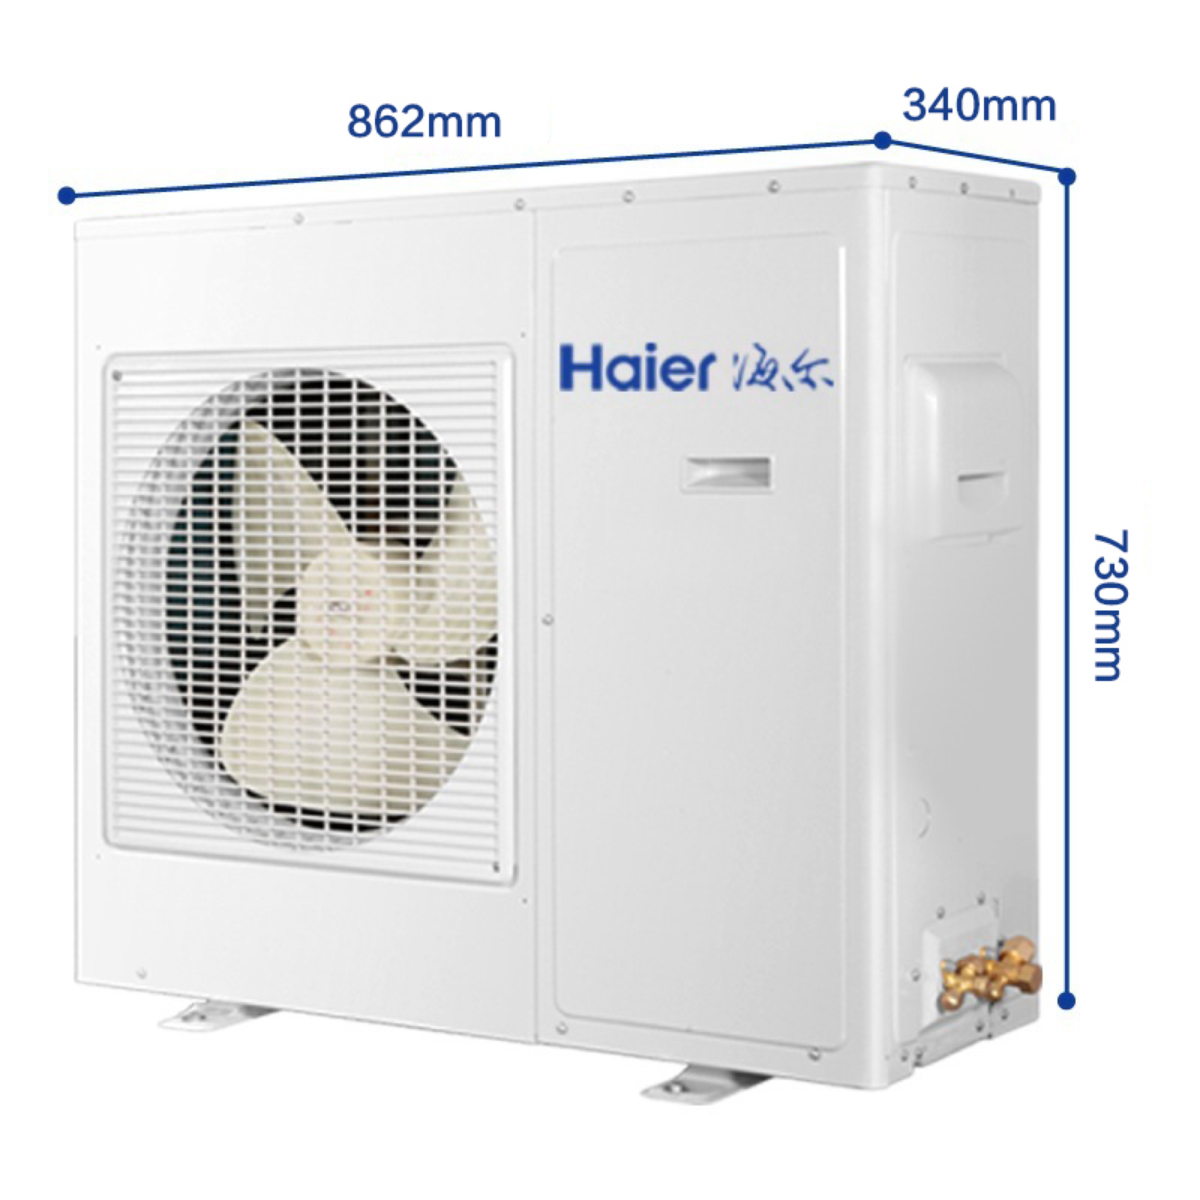 Haier/海尔                         家用中央空调                         海尔 空调 KFRD-71NW/620套机